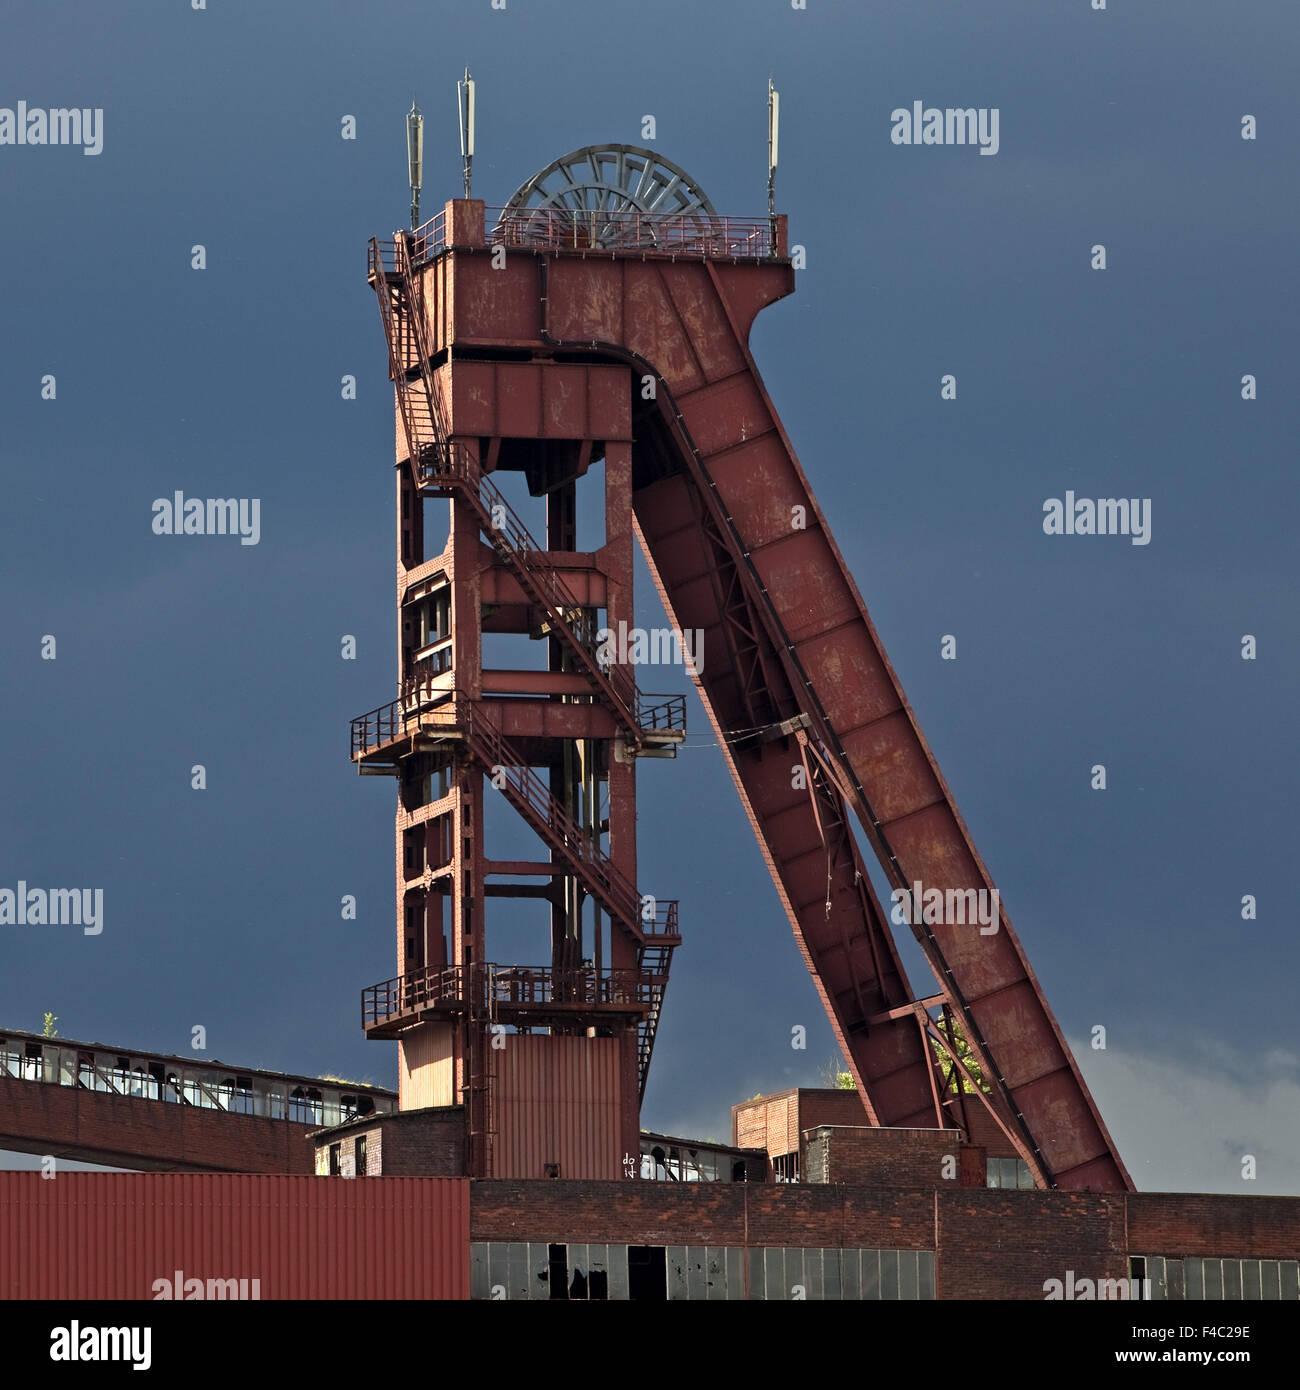 Colliery Schlaegel and iron, Herten, Germany - Stock Image